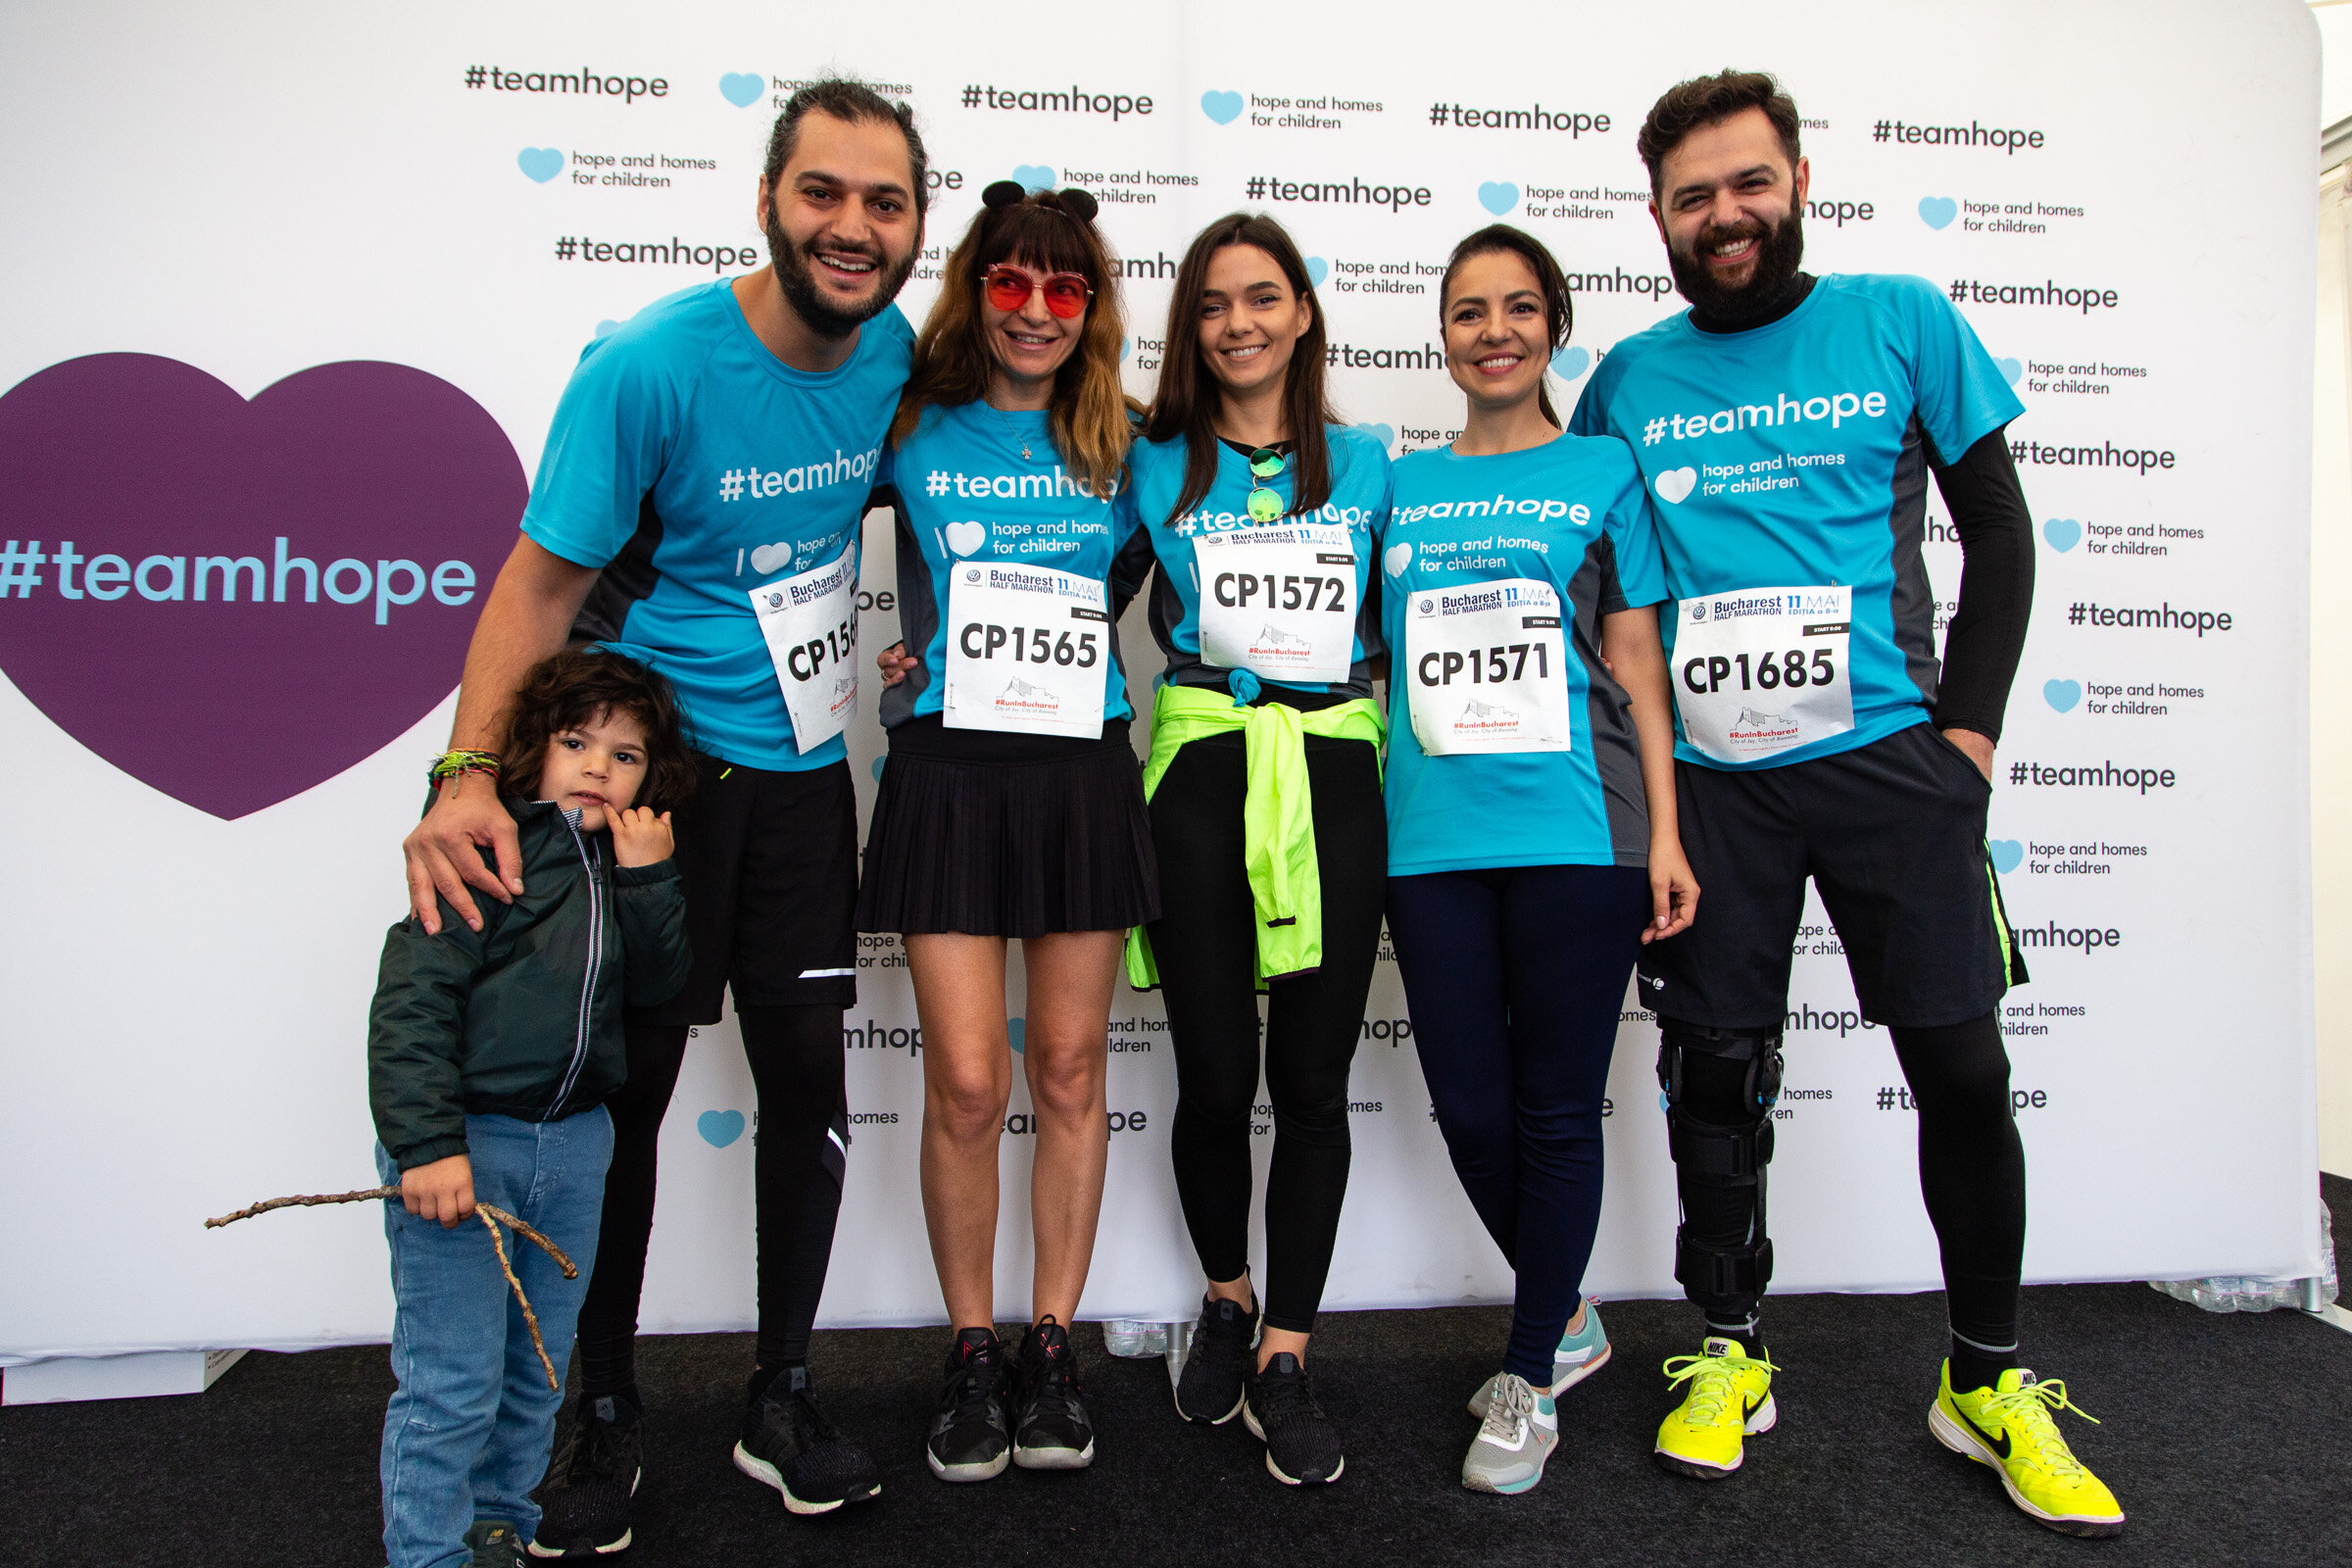 Echipa Visuri la cheie_Semimaratonul bucuresti_02_Foto MIhnea Ciulei.jpg